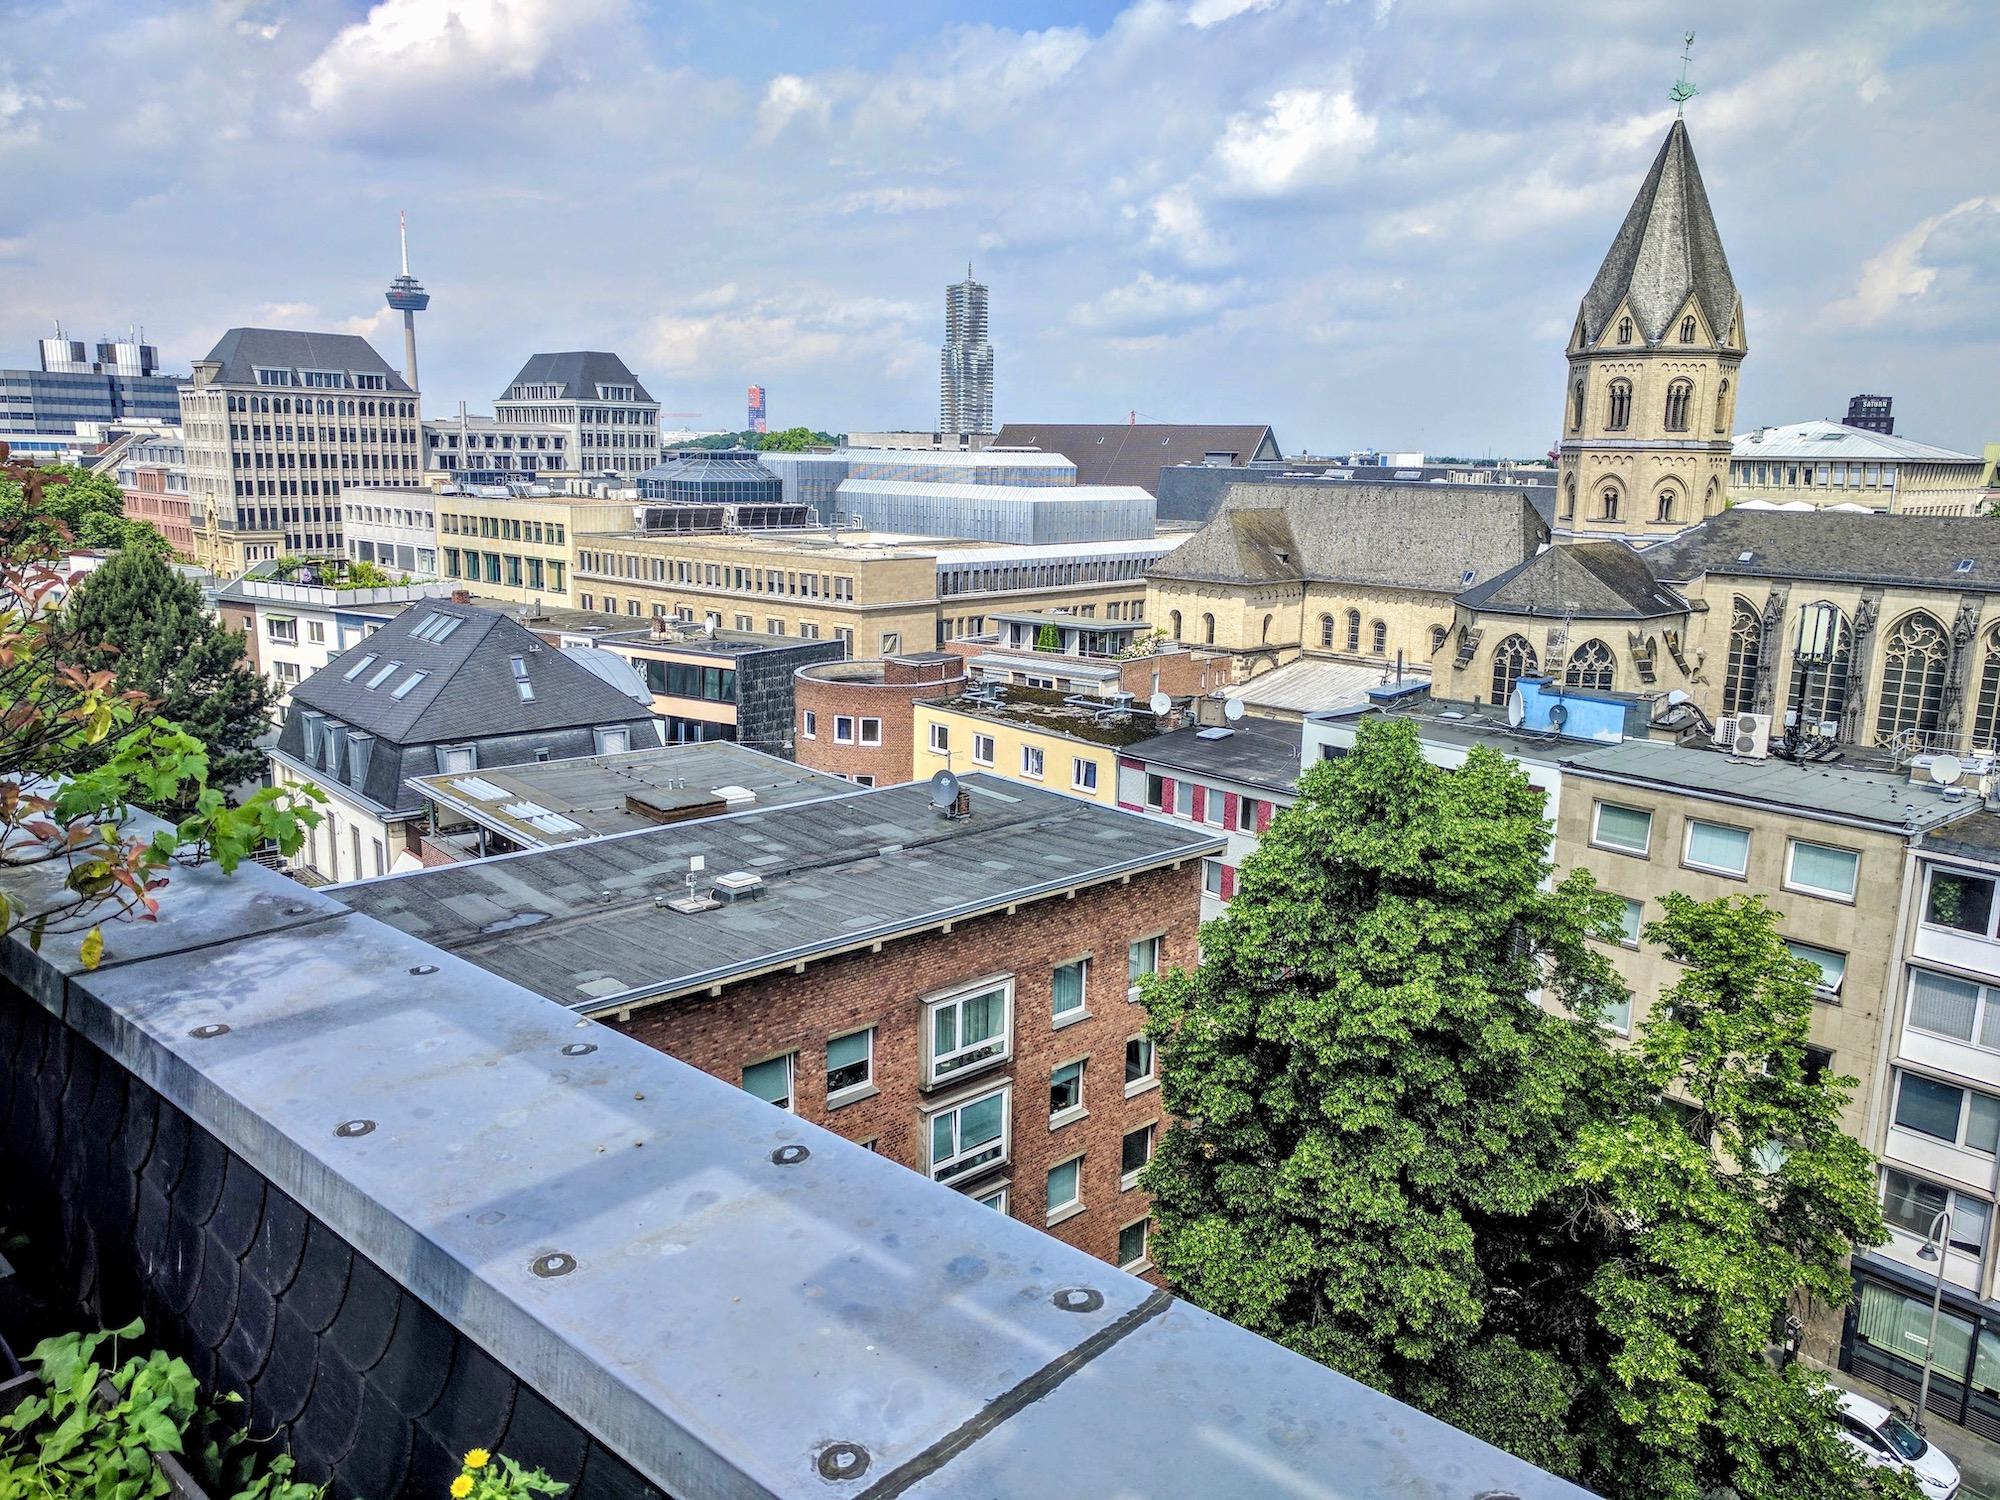 Blick auf Köln (vom WDR-Funkhaus am Wallrafplatz)